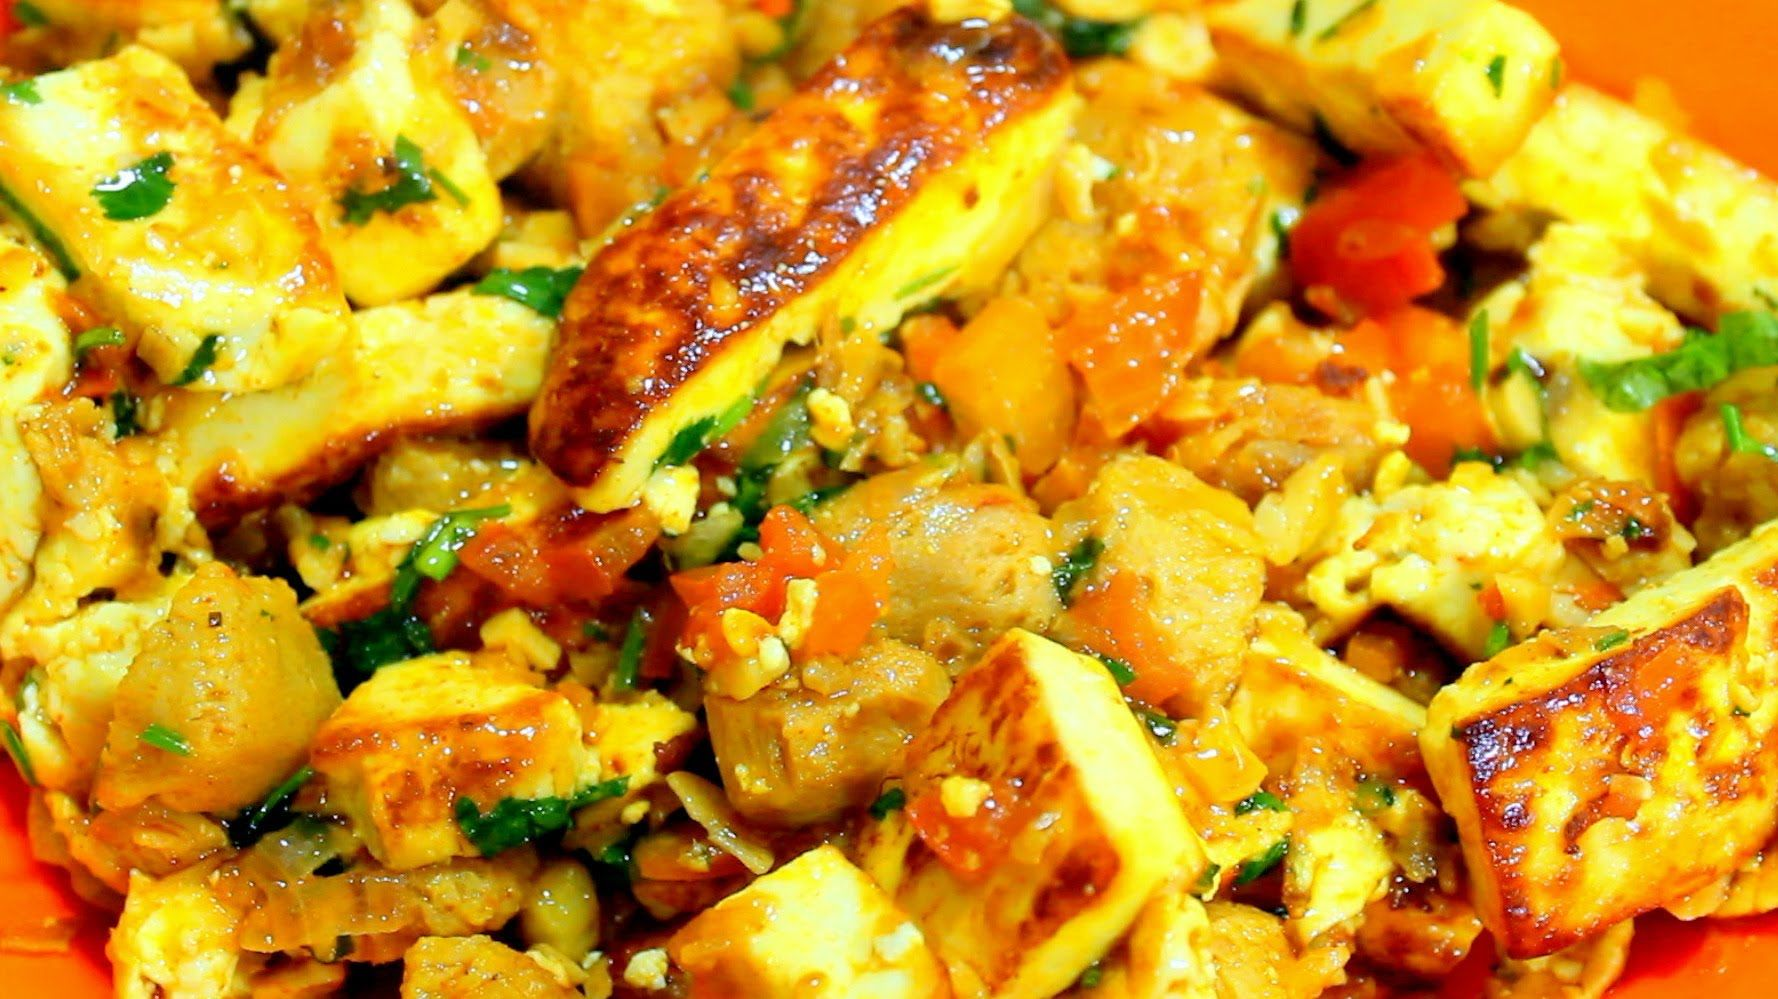 Recipe paneer soyabean ki sabji easy cook with food junction recipe paneer soyabean ki sabji easy cook with food junction forumfinder Choice Image